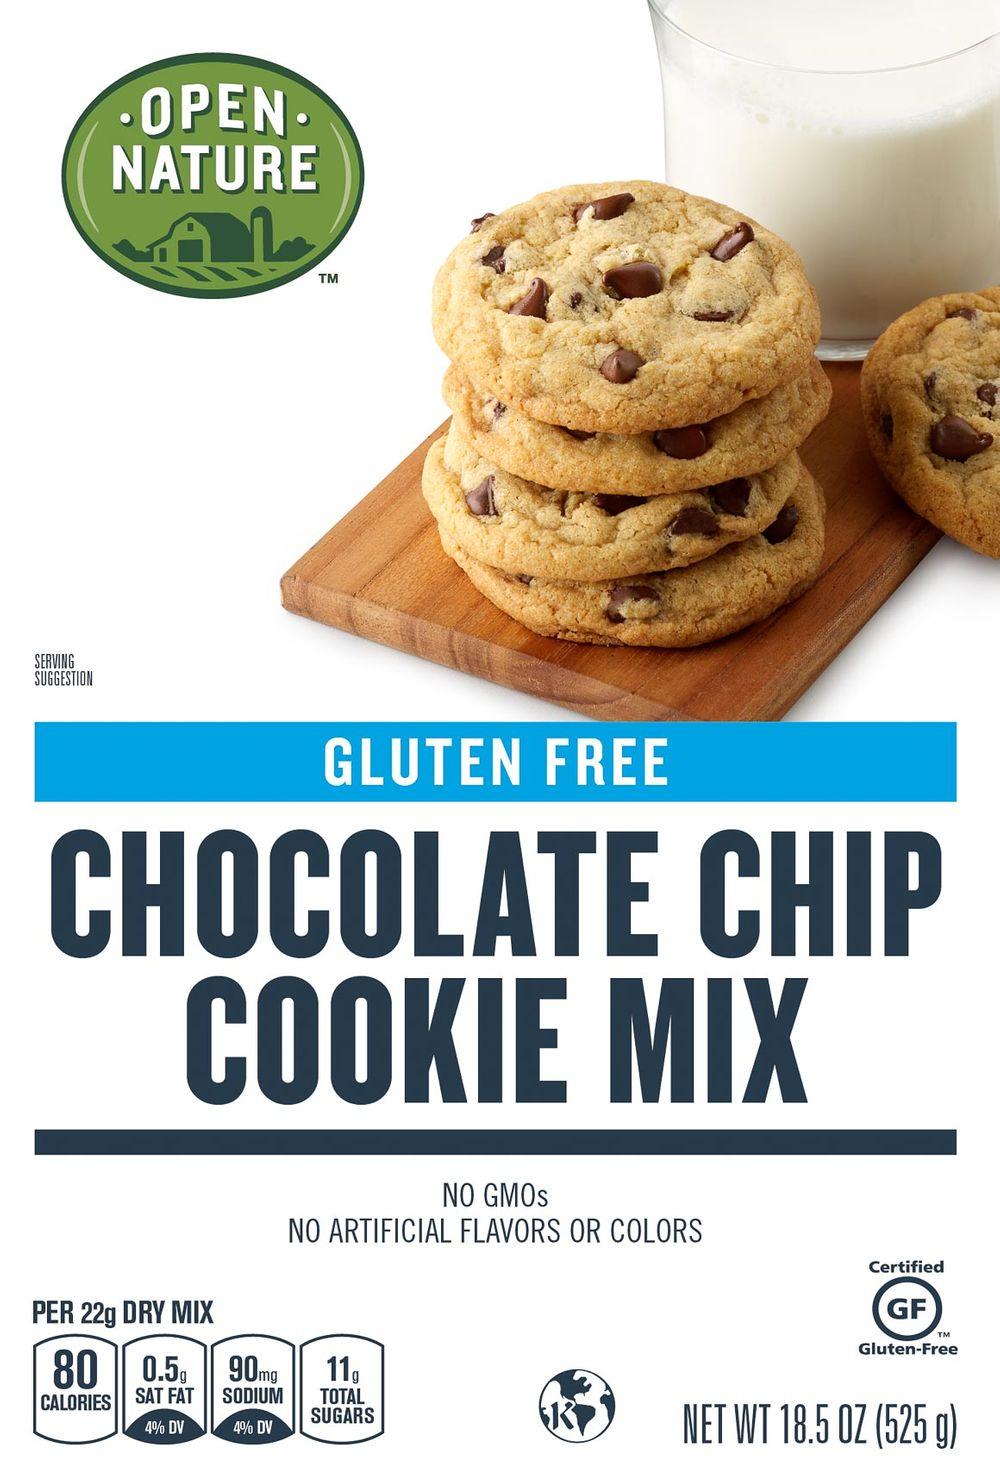 Open_Nature_gluten_free_chocolate_chip_cookie_mix.jpg